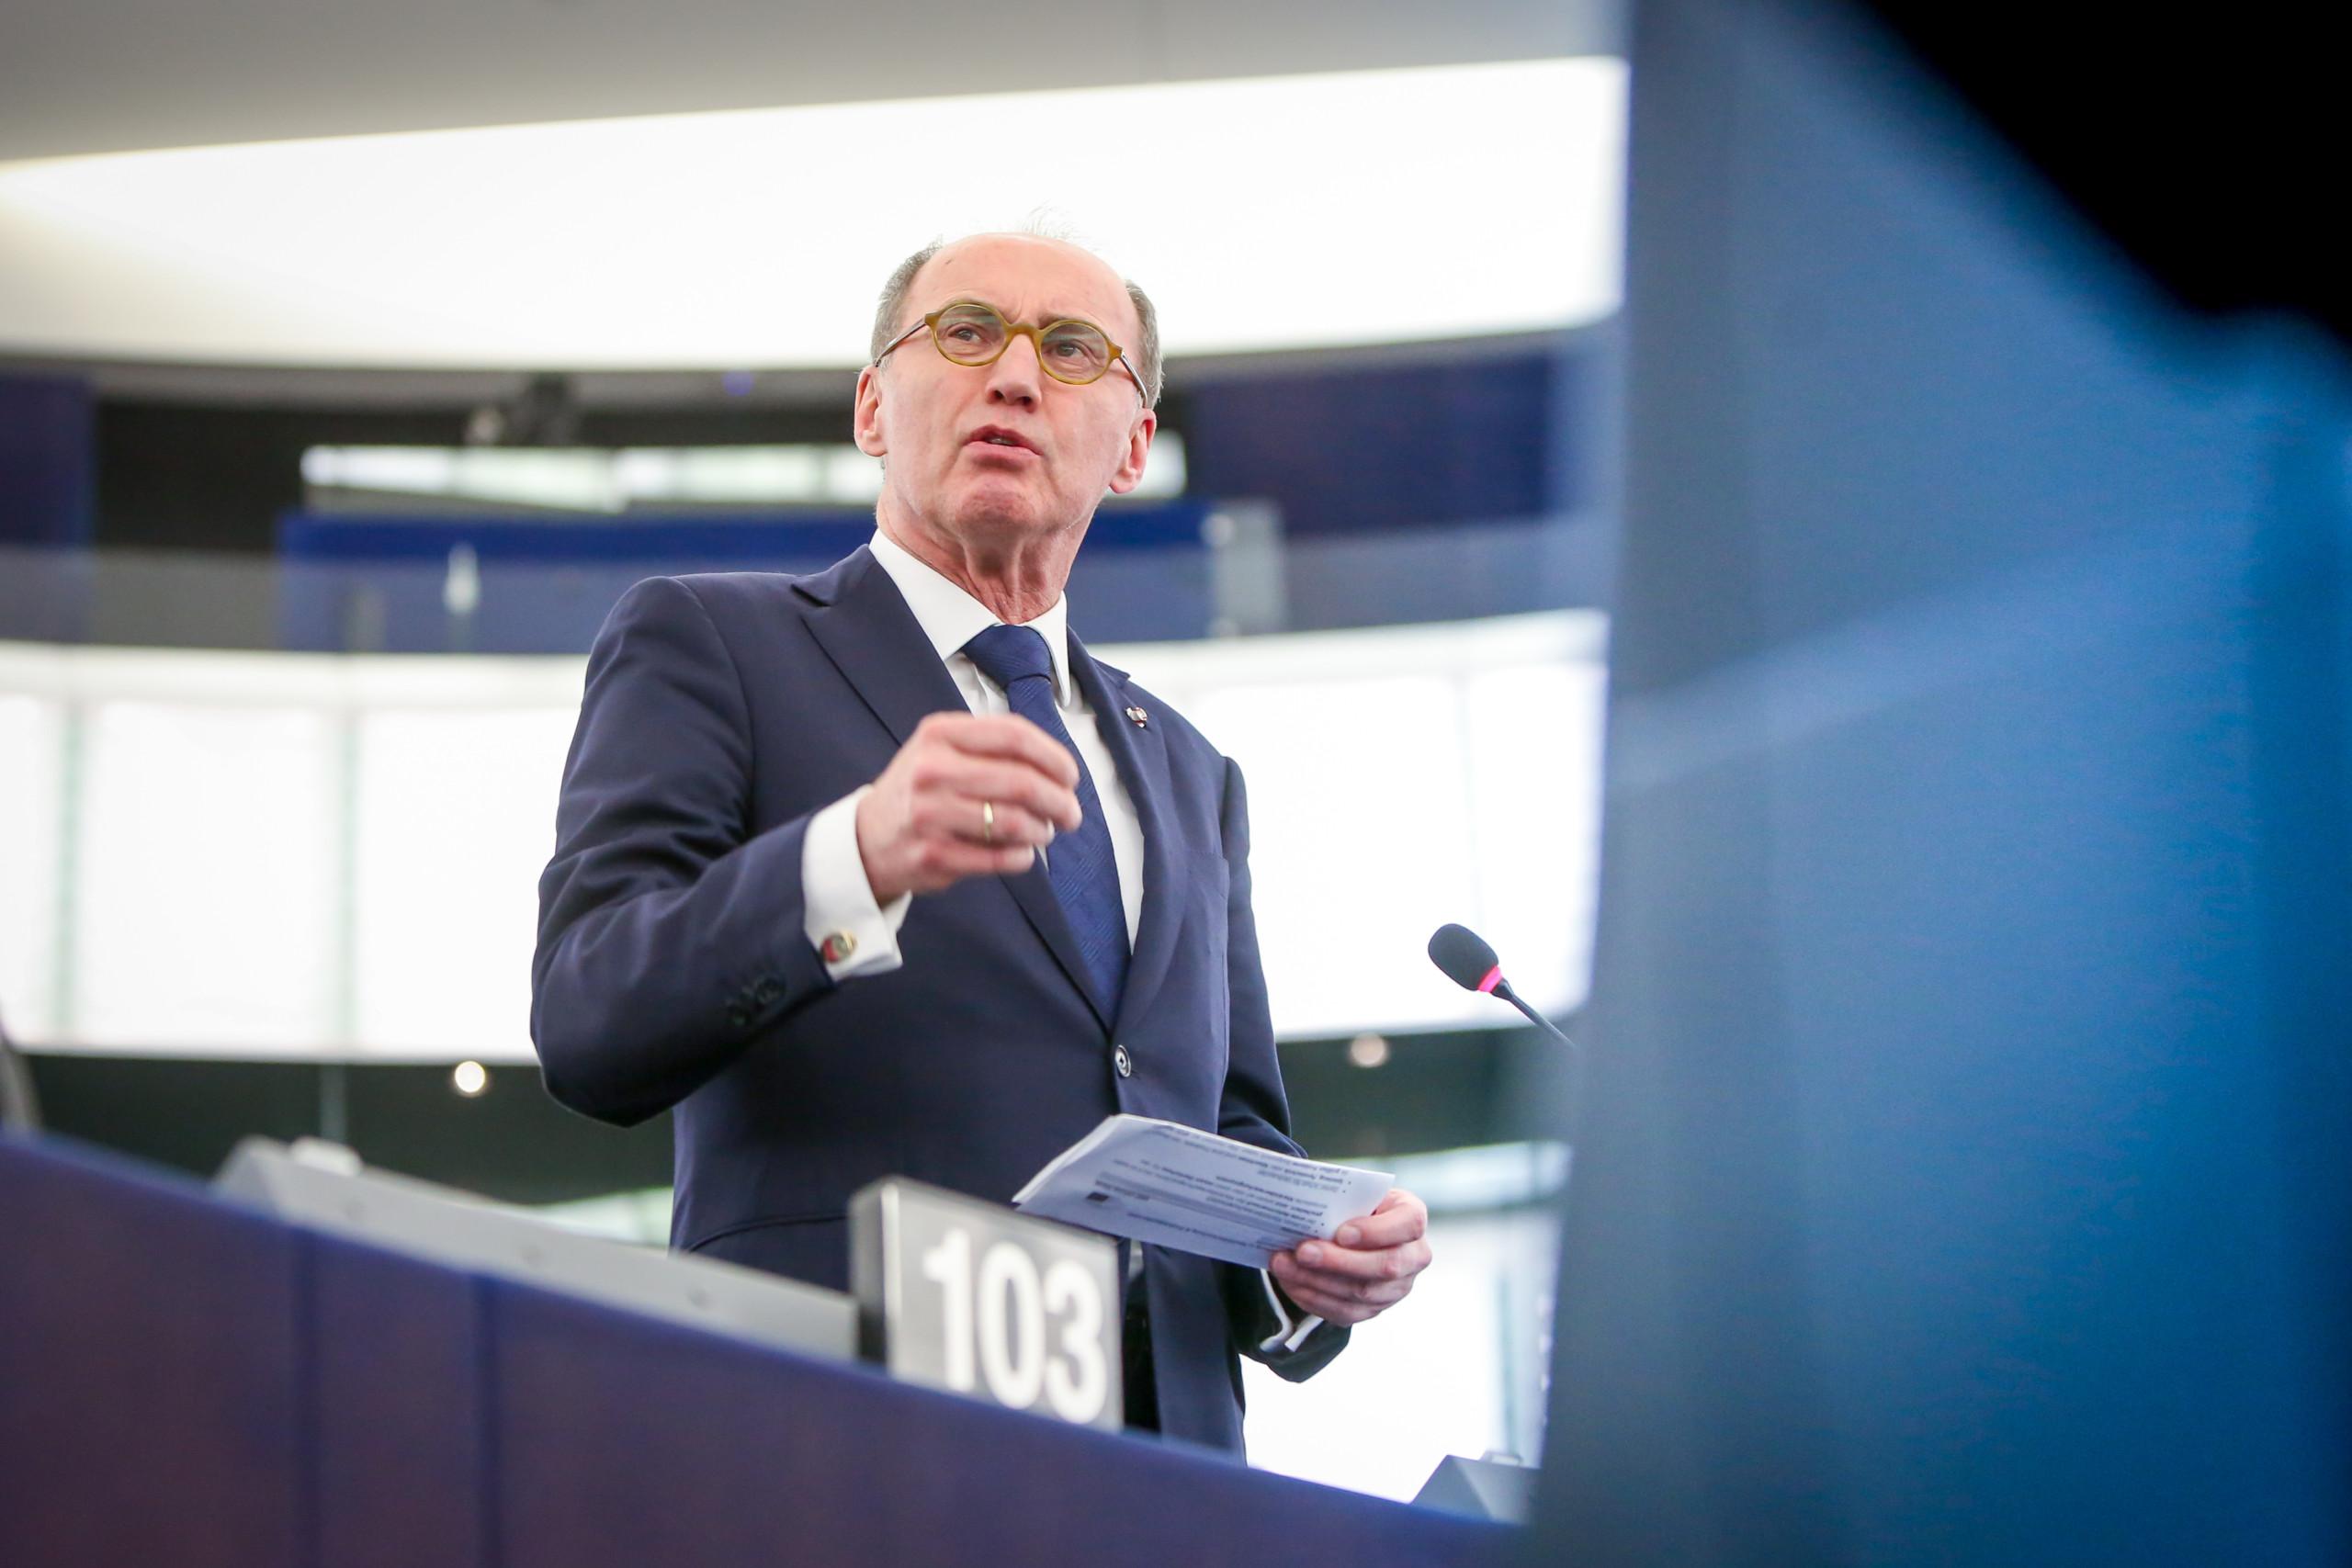 Joint debate - Horizon Europe